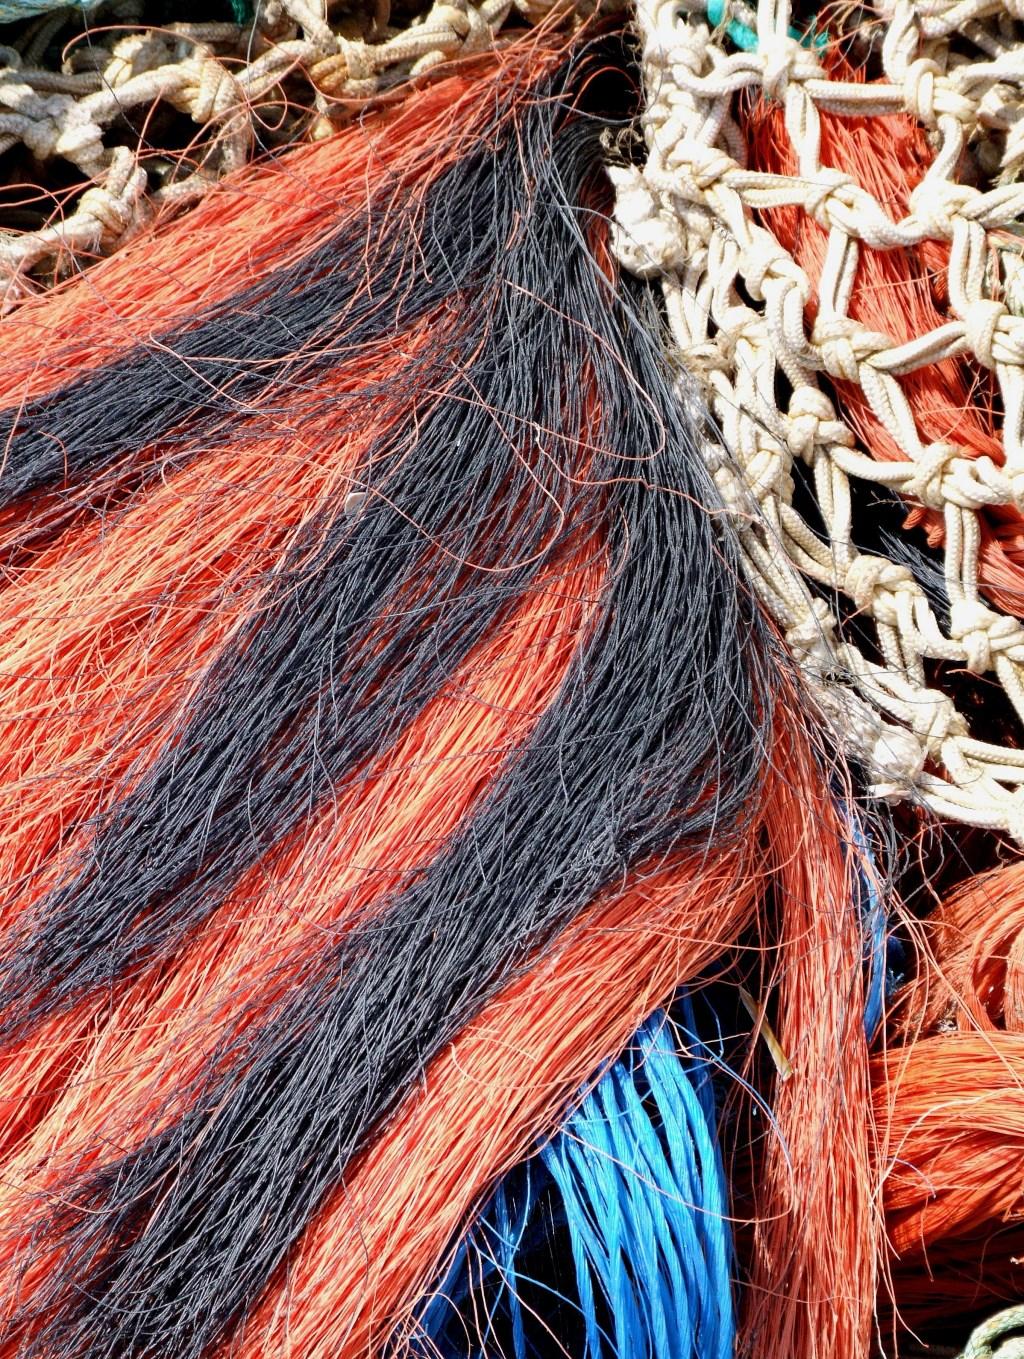 Detailopname van visnetten. (Foto: Gerard Eilander) © rodi